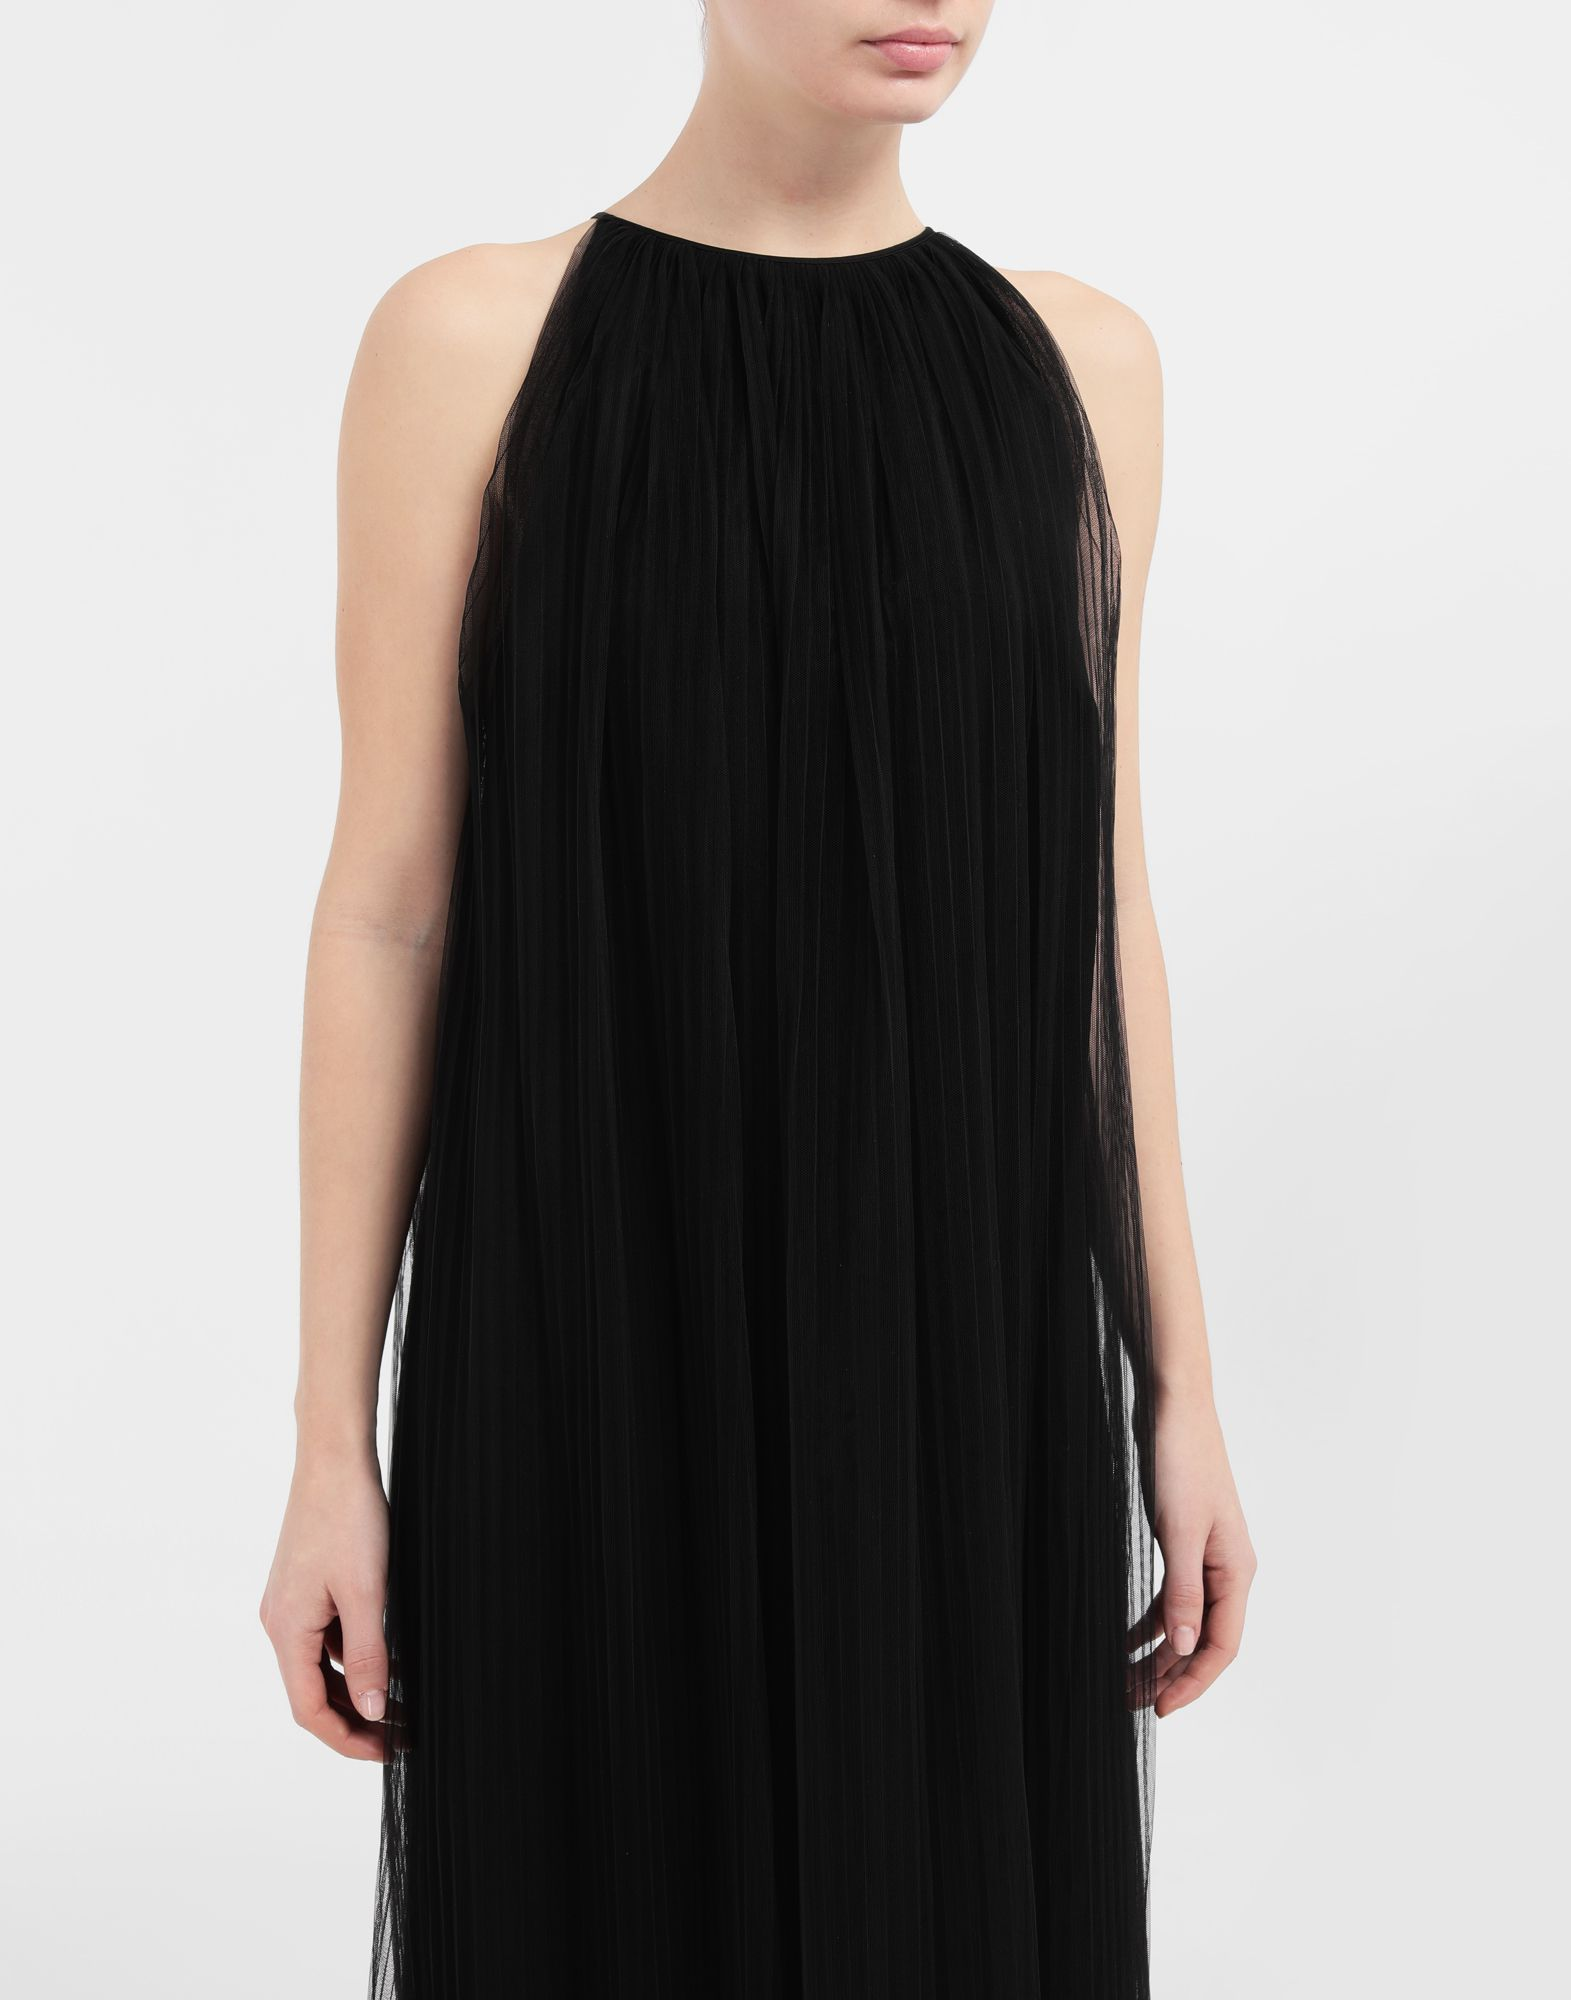 MAISON MARGIELA Layered tulle midi dress 3/4 length dress Woman a